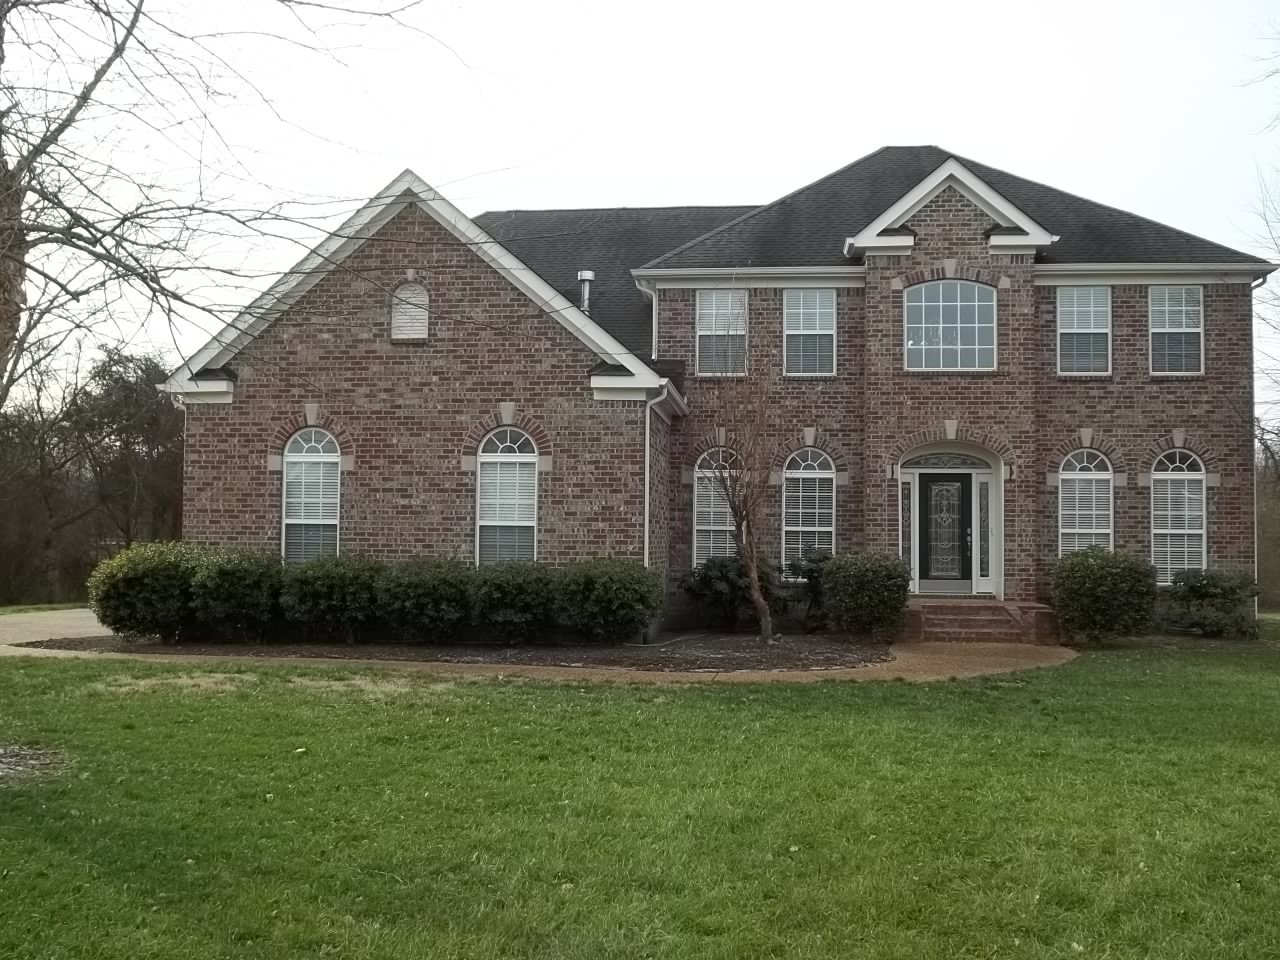 813 Breckston Ln, Nashville, TN 37221 - Nashville, TN real estate listing